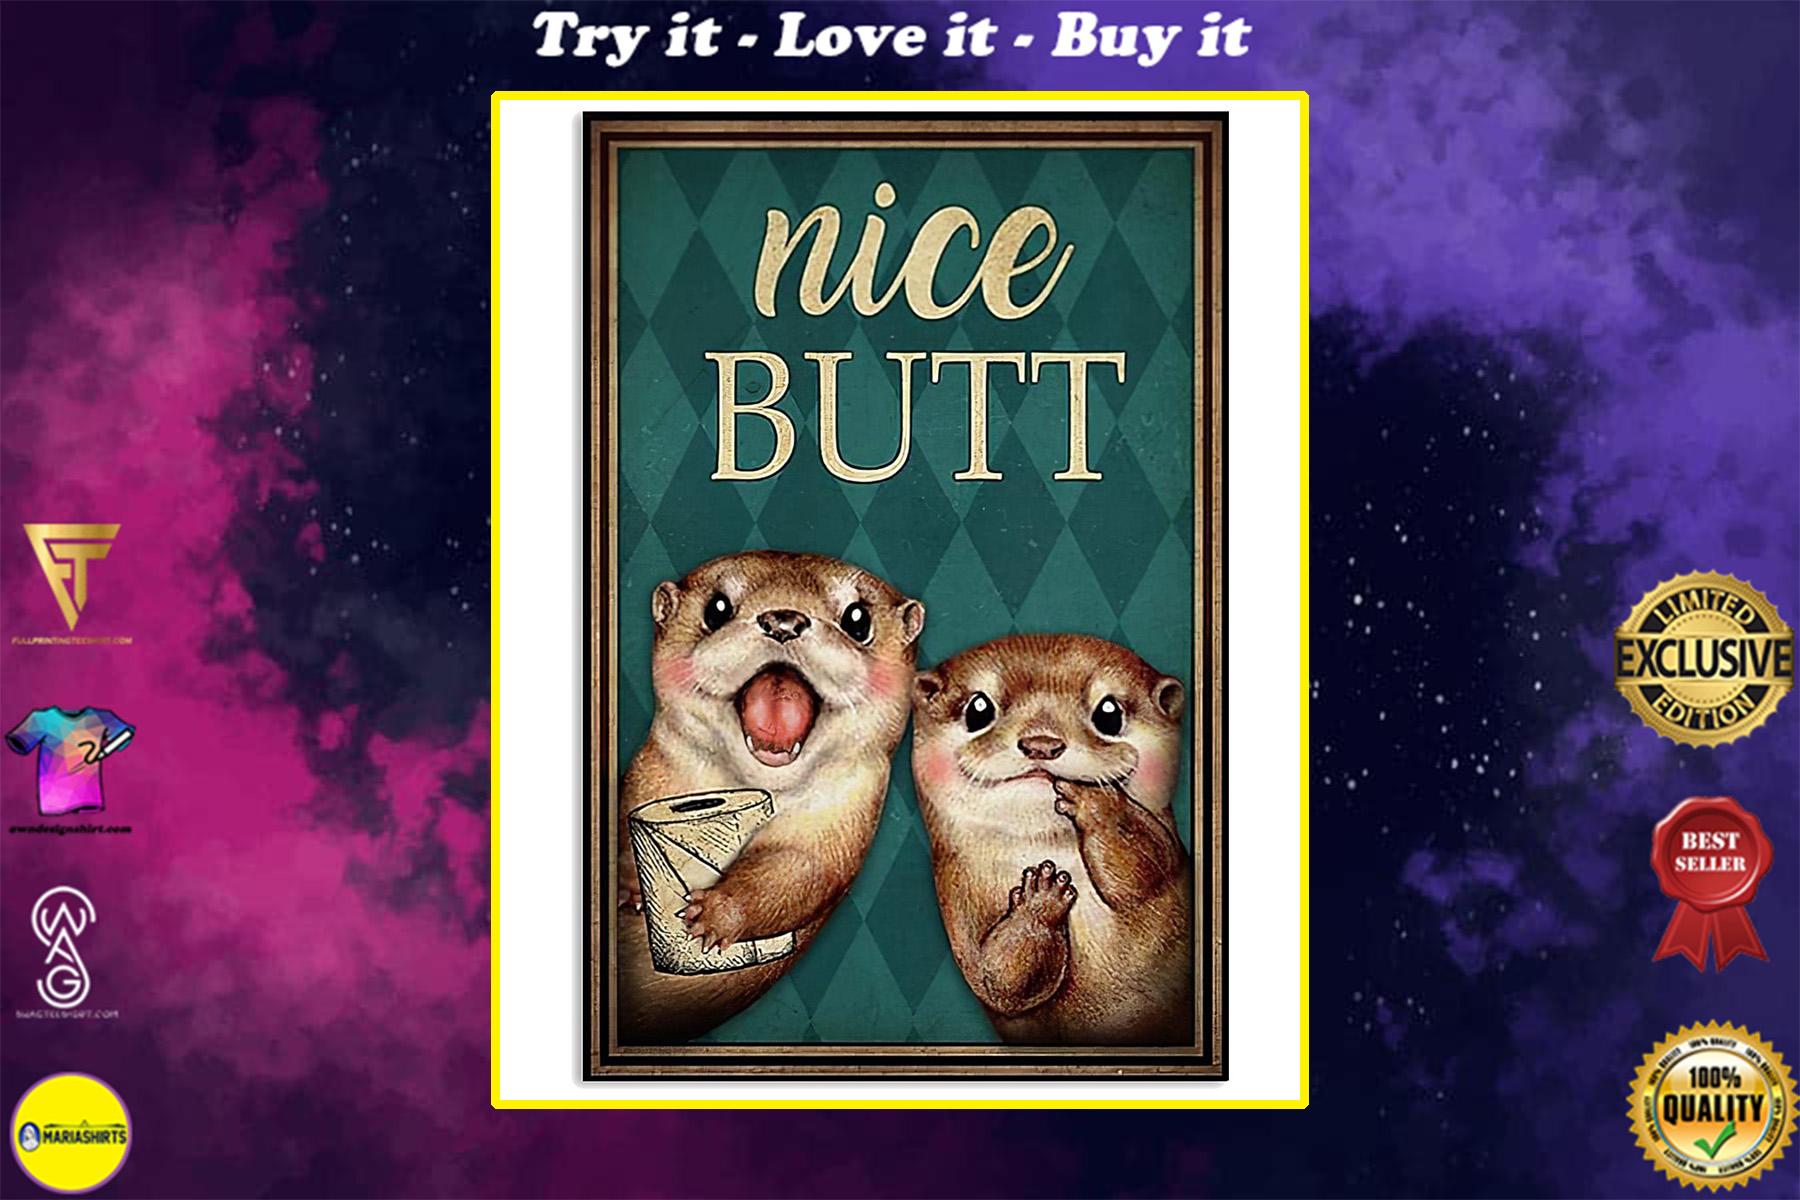 otter nice butt vintage poster